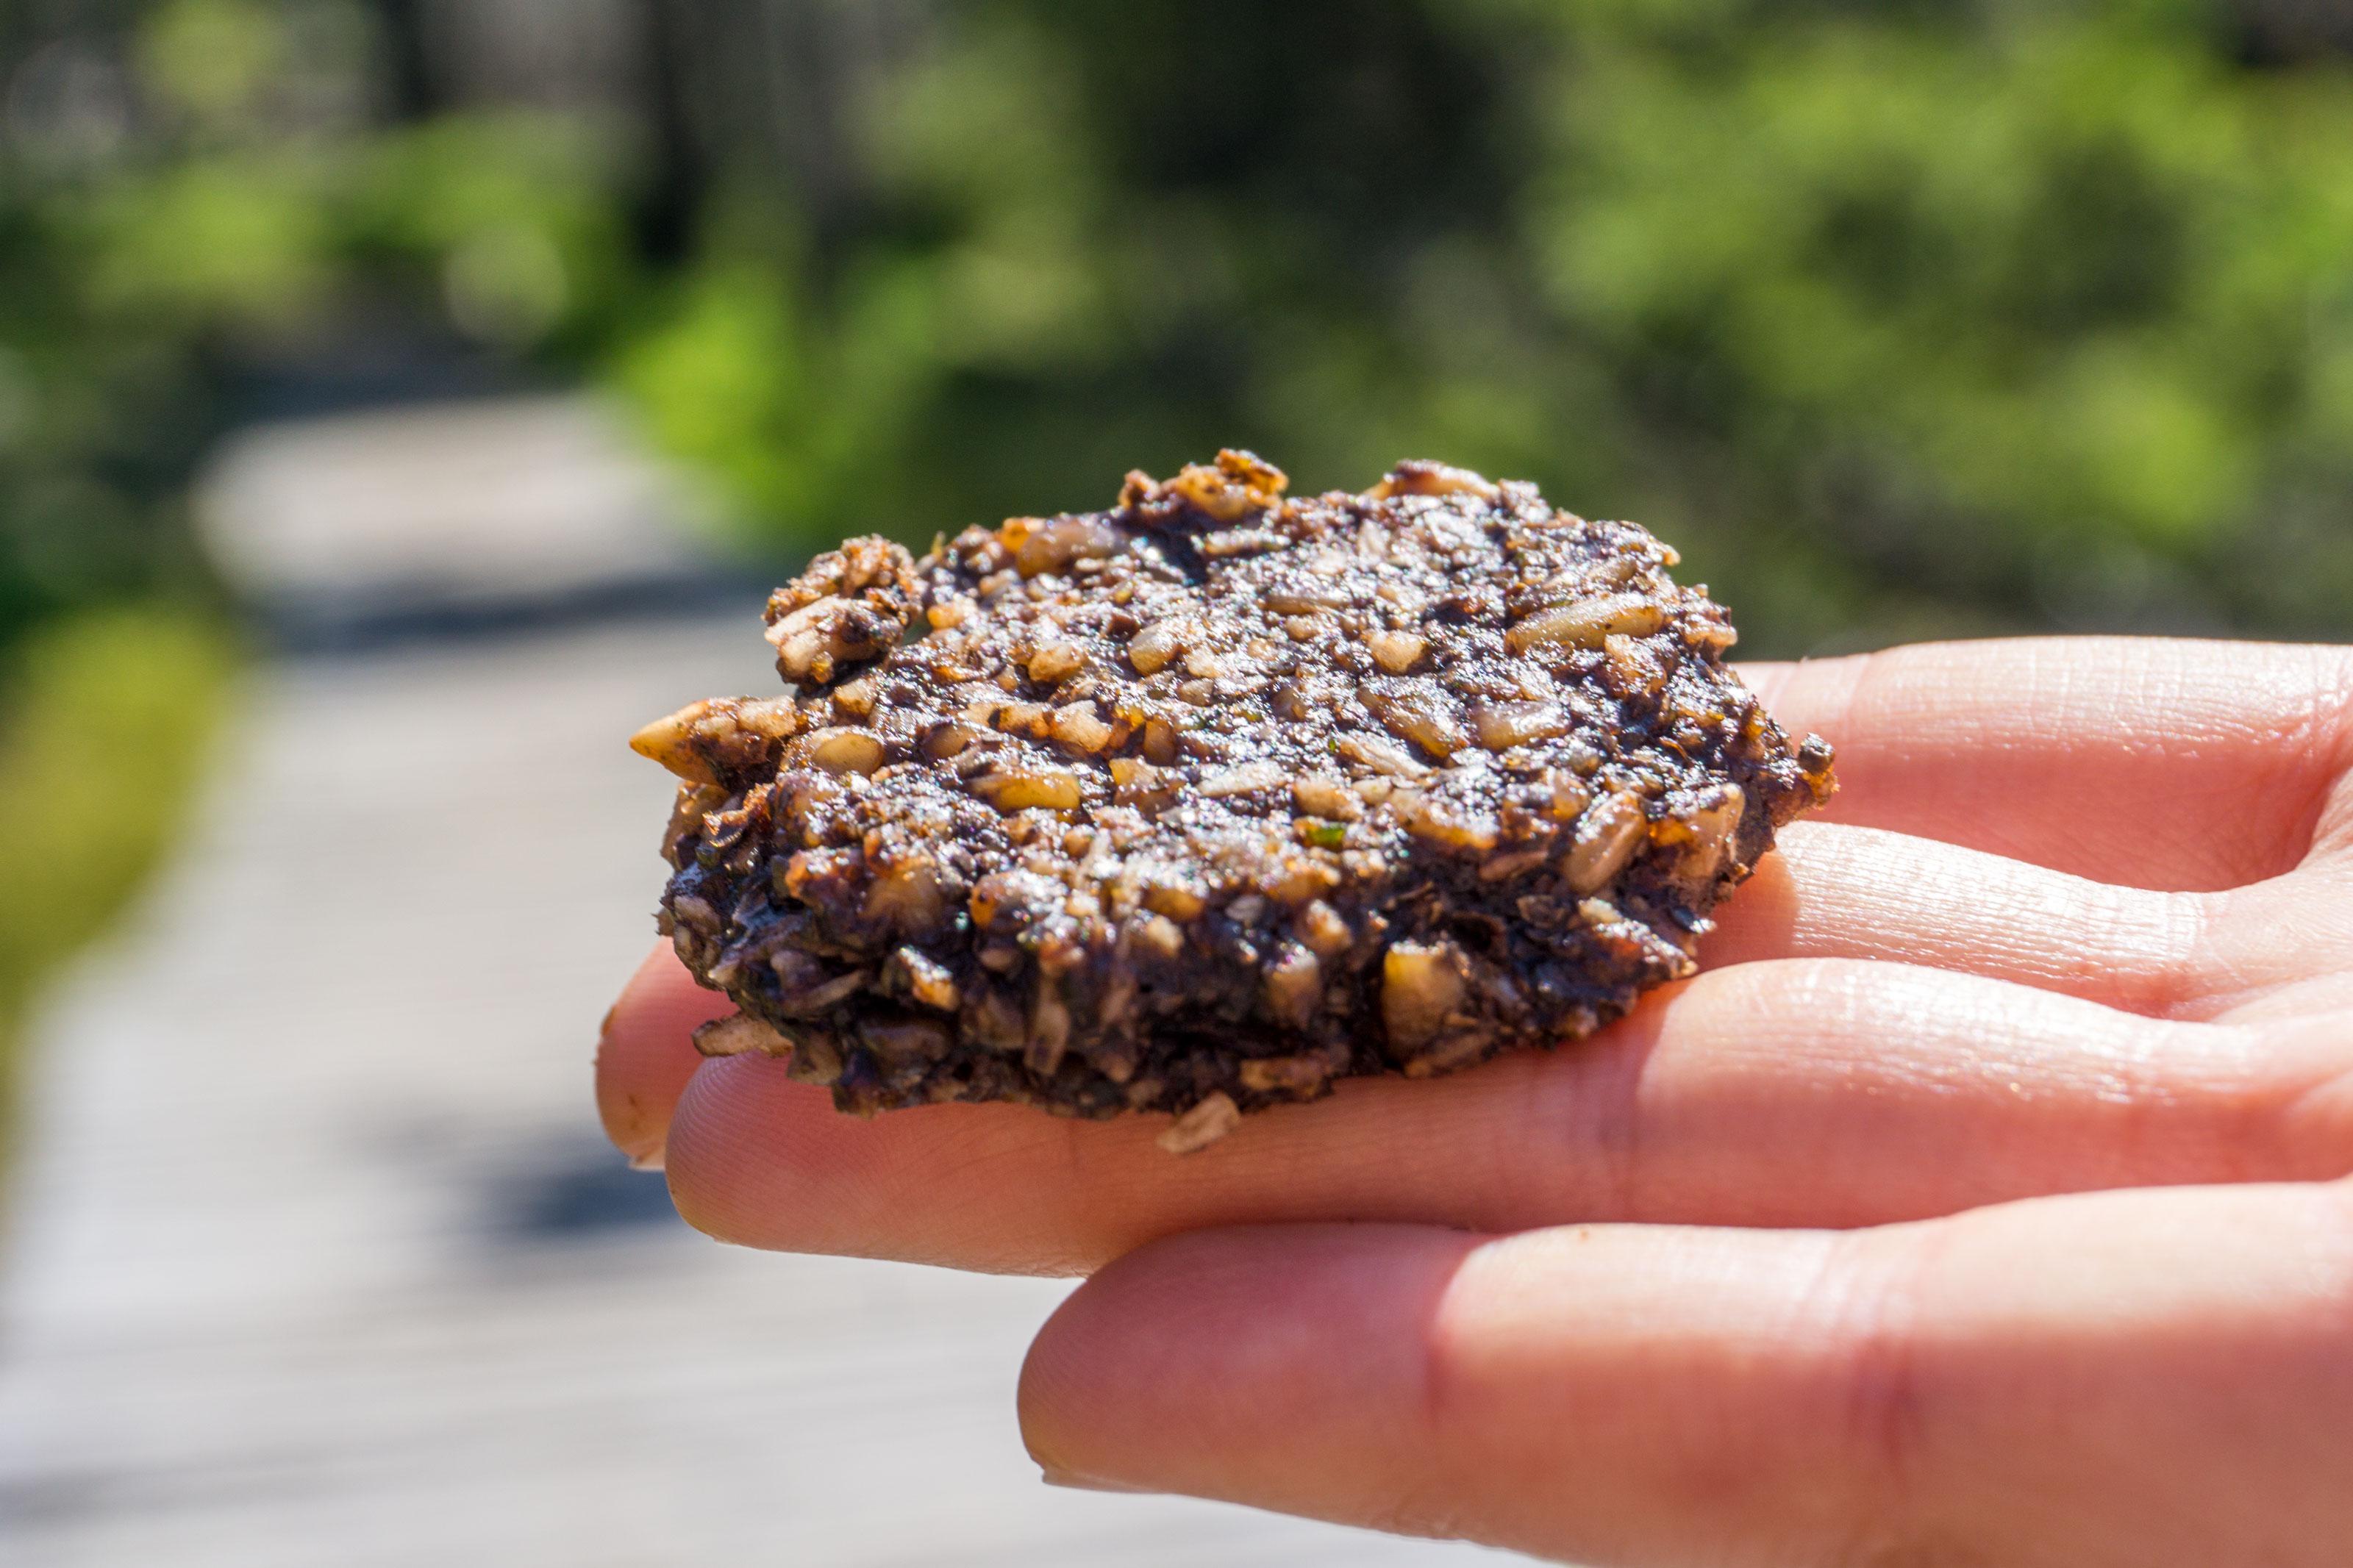 Kakaové sušenky z konopného semínka